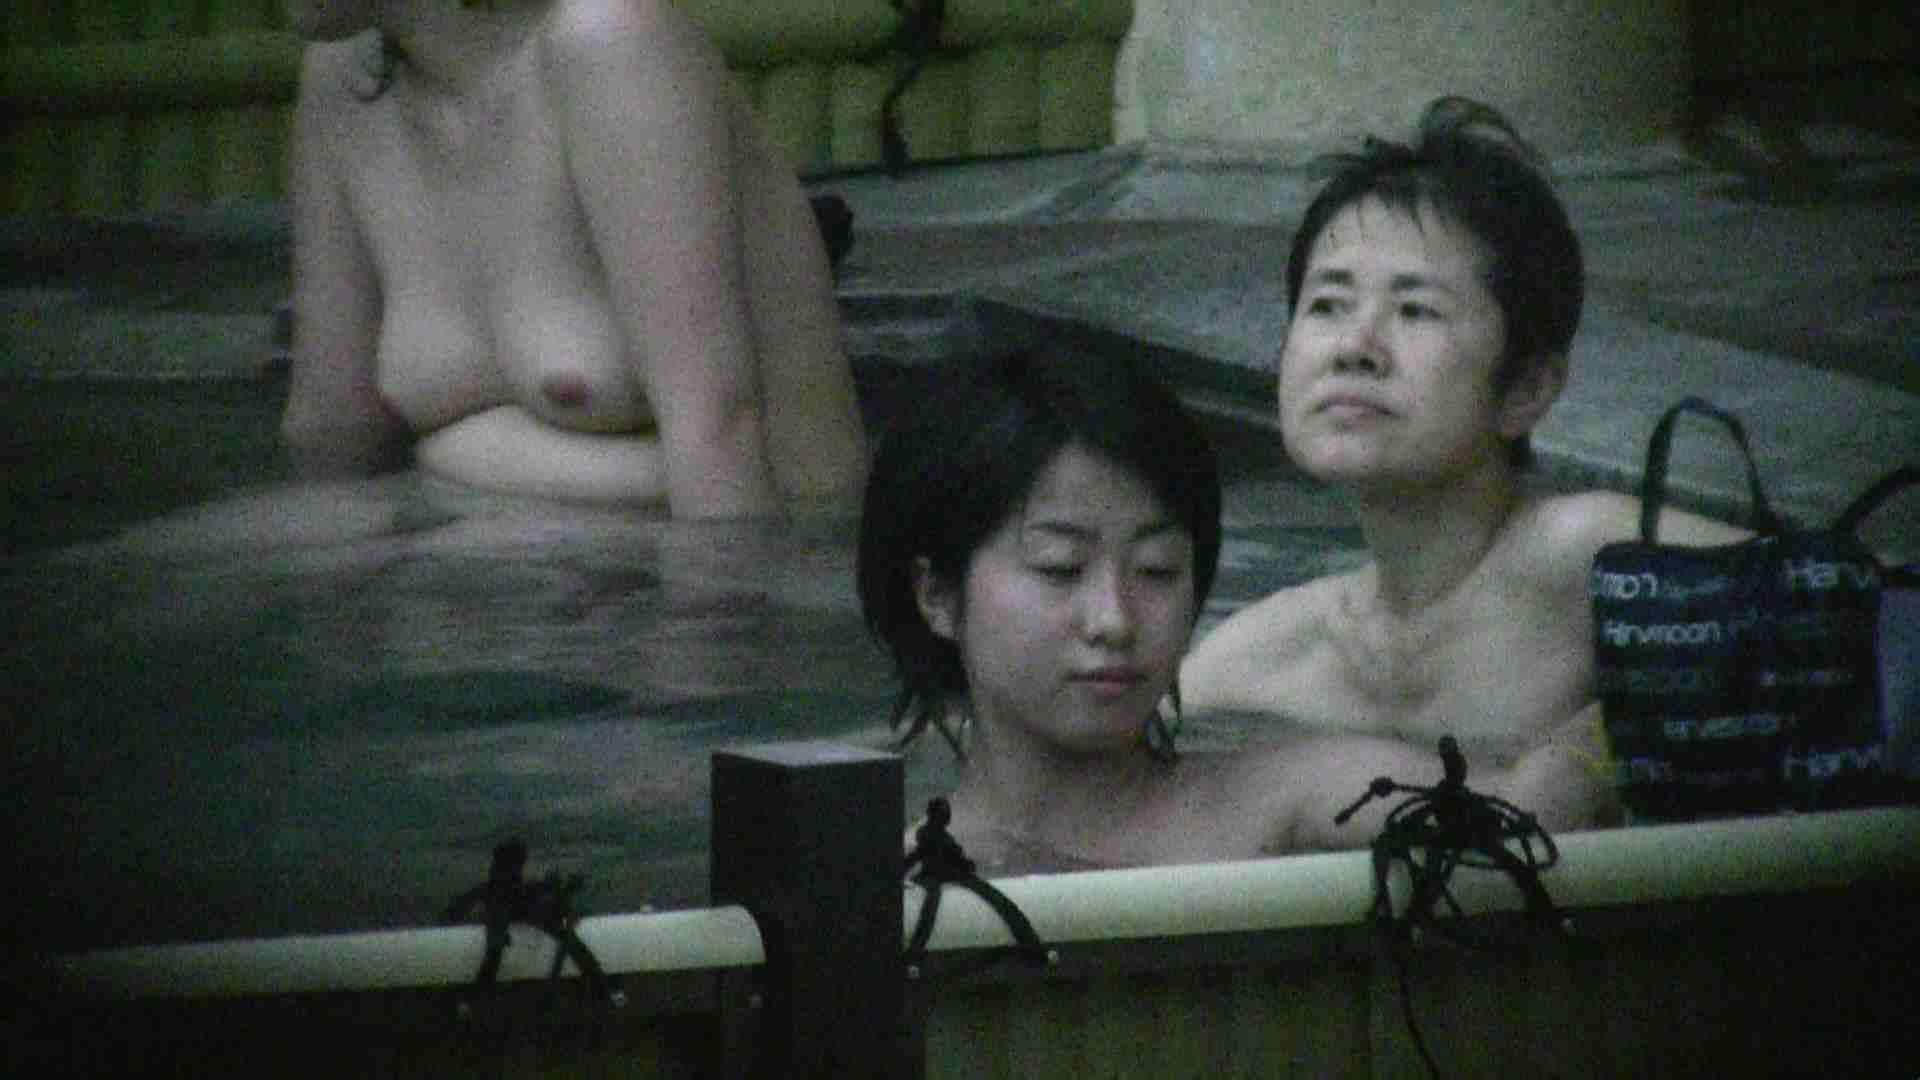 Aquaな露天風呂Vol.112 0  68連発 2